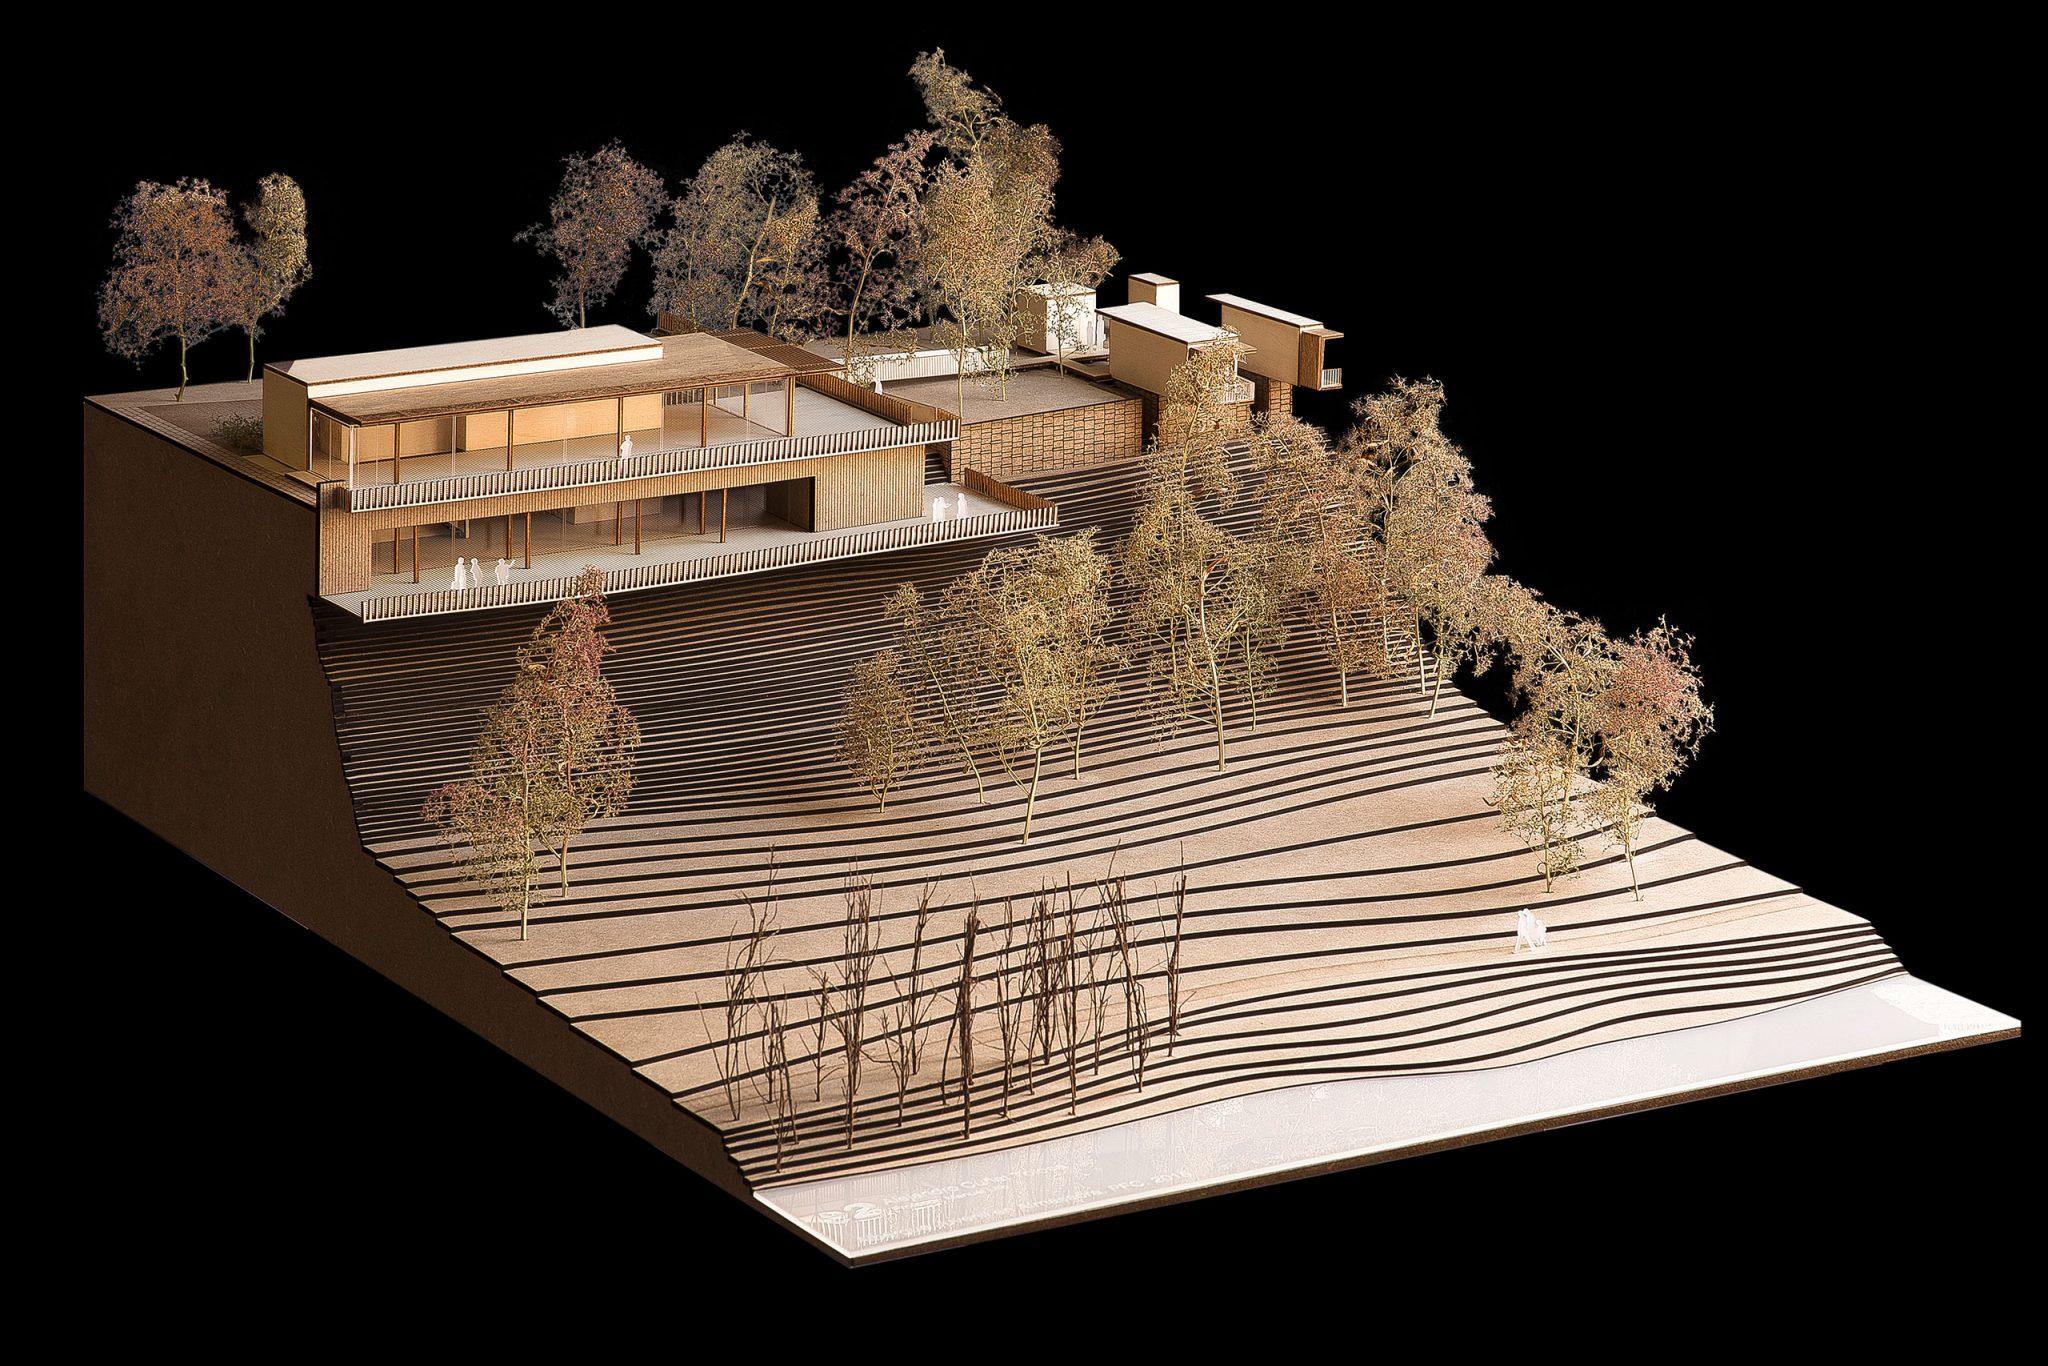 models architectural wooden mountain architecture 3d maquette maqueta hostel arquitectura